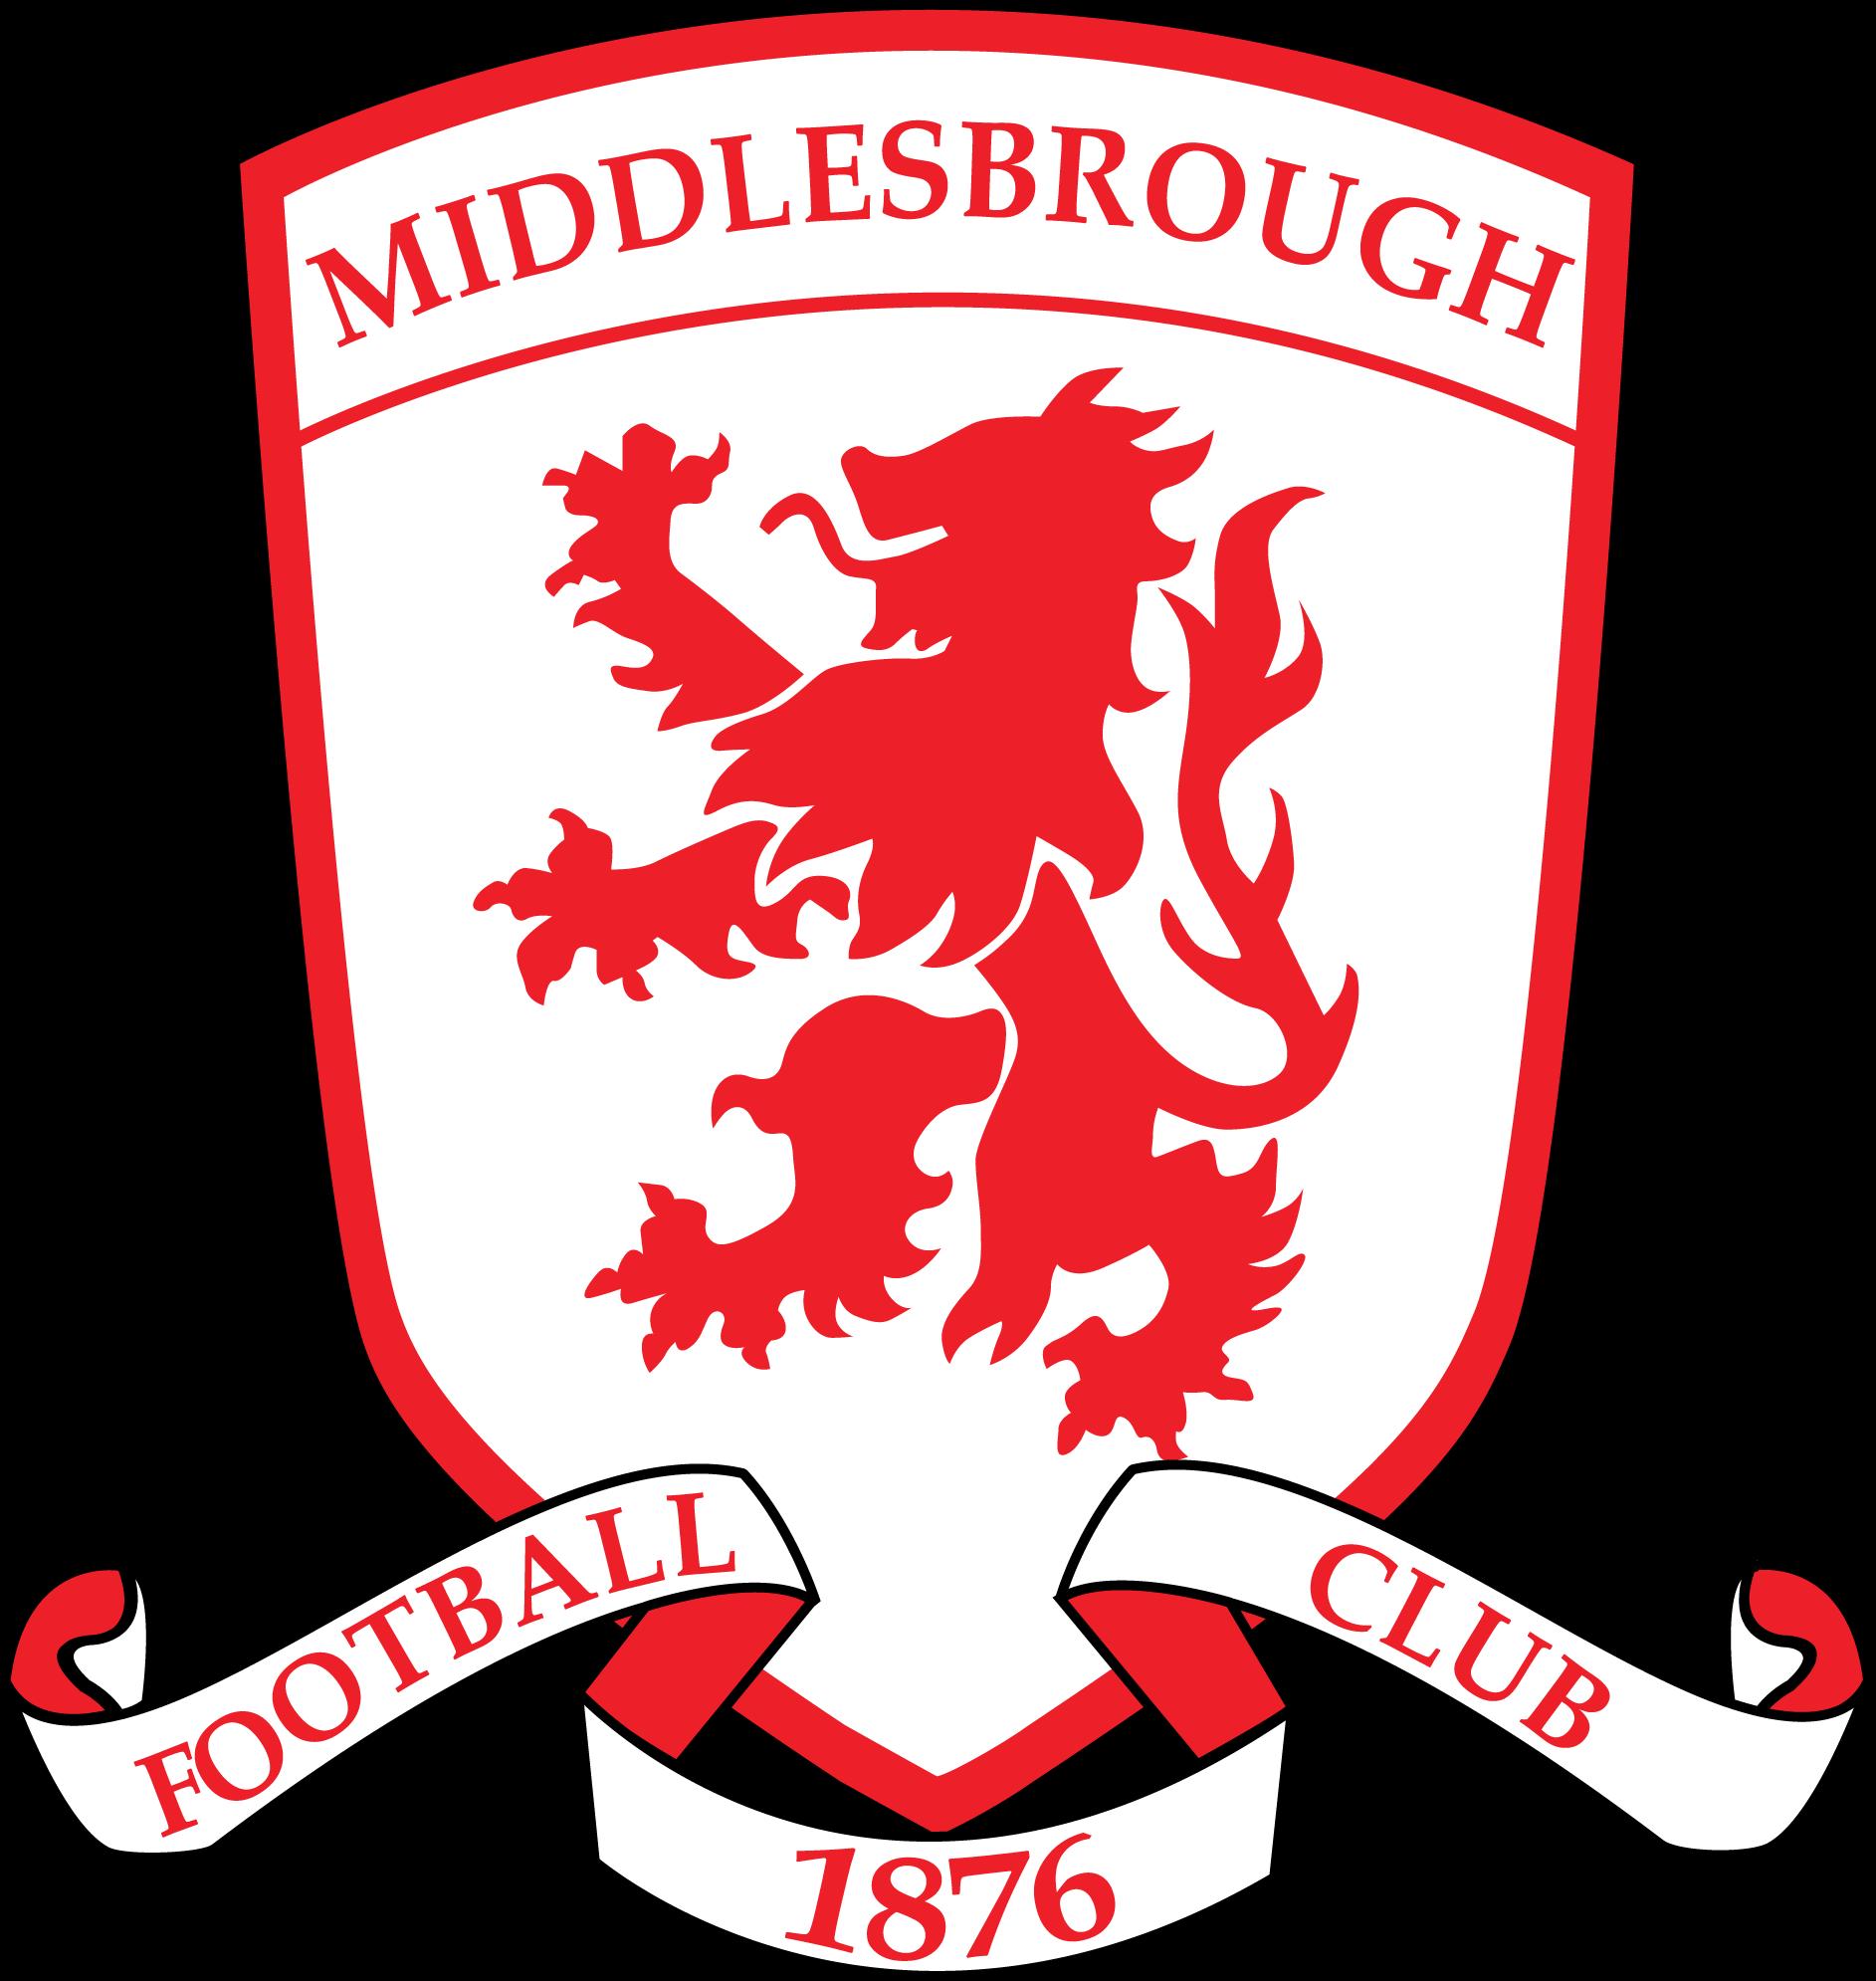 Lightning bolt football clipart clip art library Middlesbrough FC | Foodball teams | Pinterest | Middlesbrough fc ... clip art library